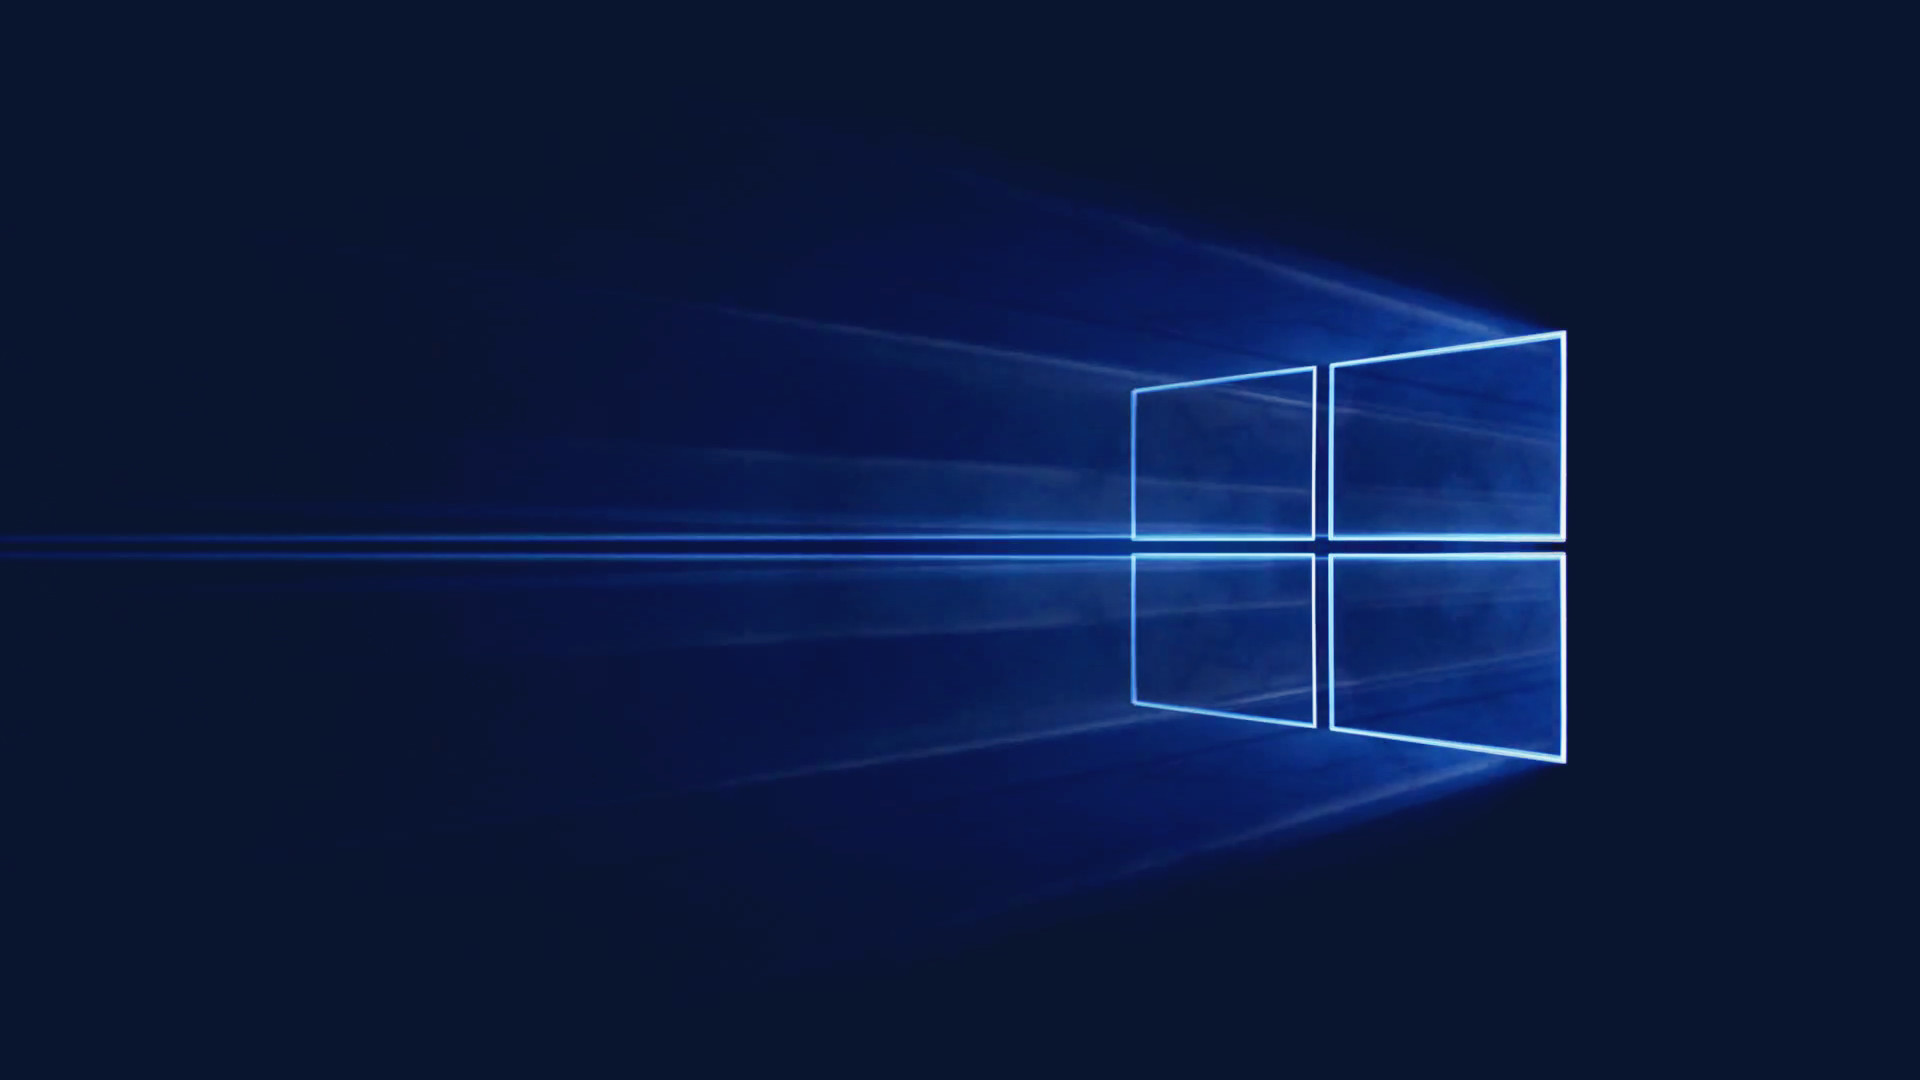 4K Windows 10 Wallpaper (61+ images)